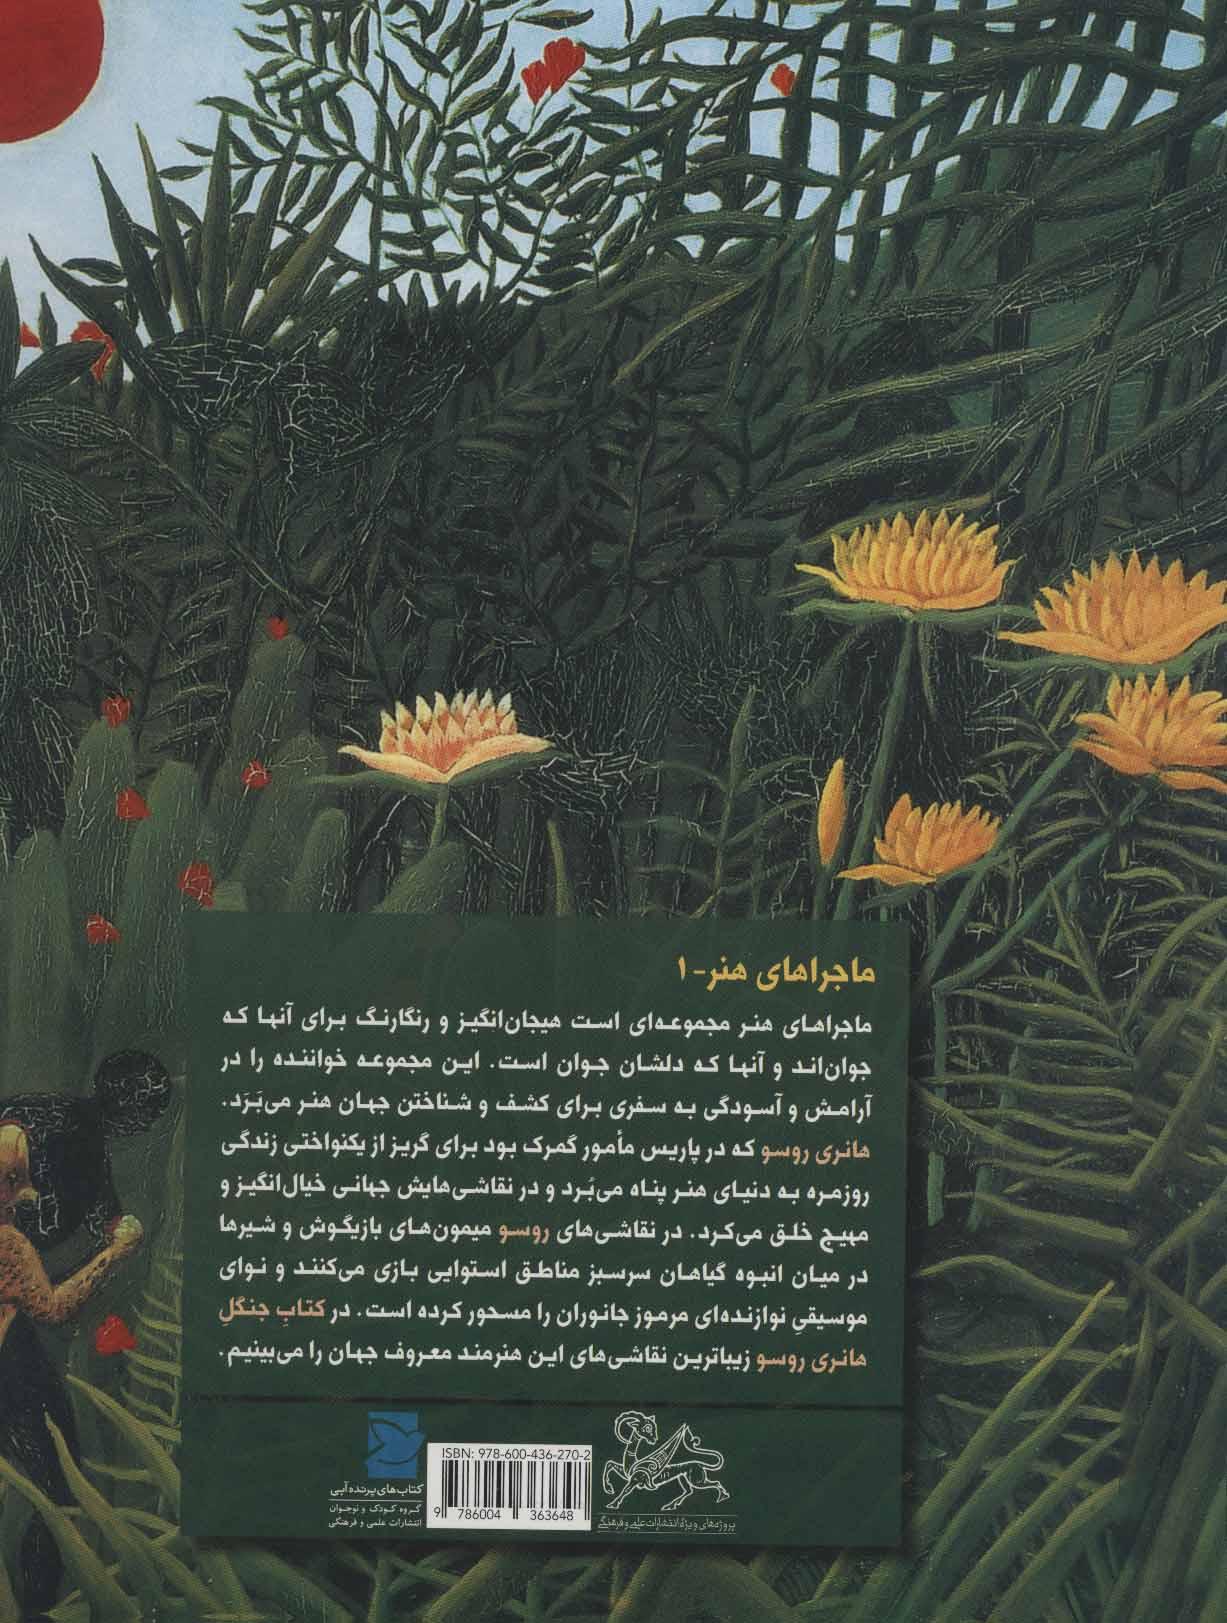 کتاب جنگل هانری روسو (گلاسه)